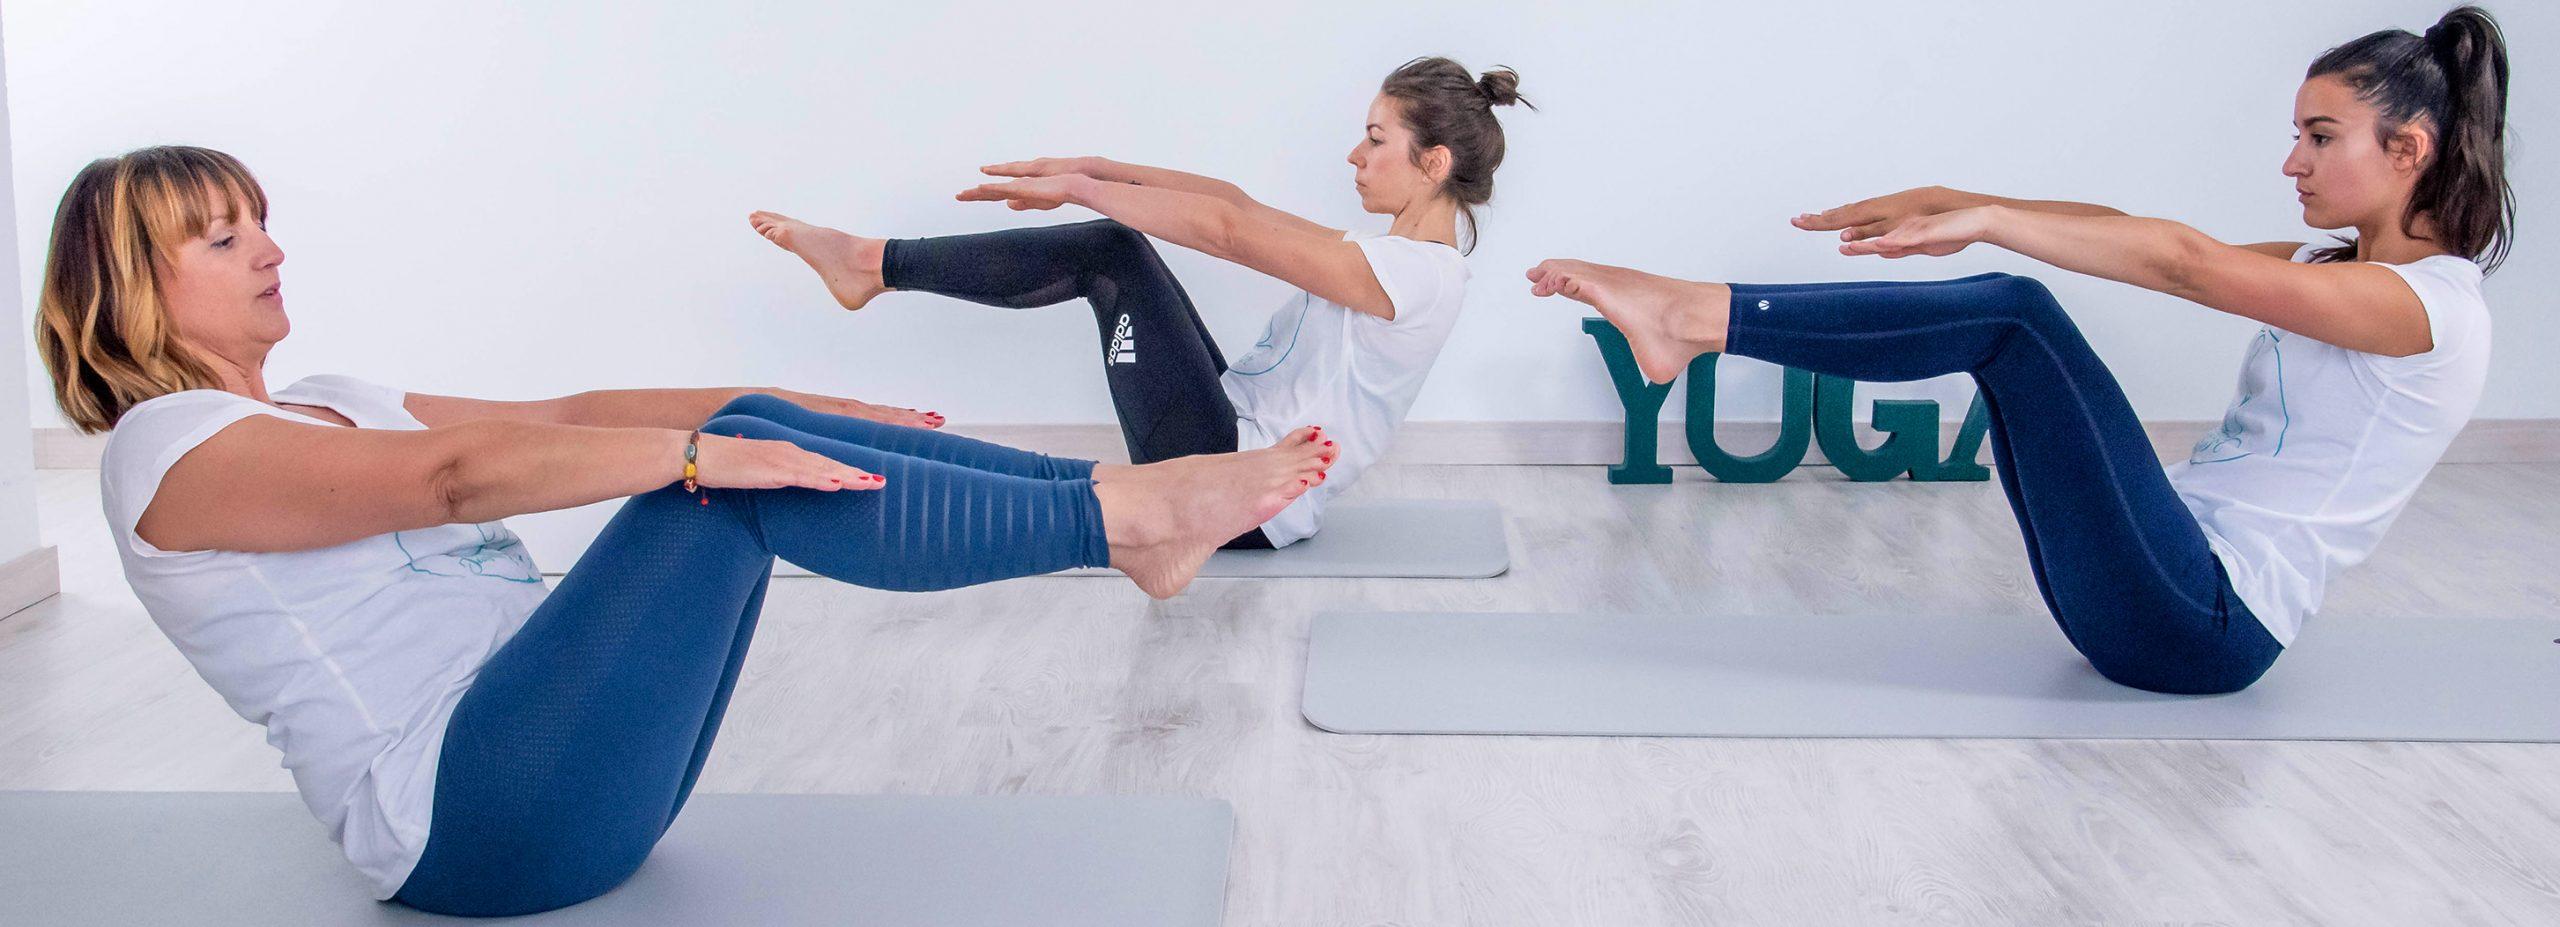 Cursos de Yoga - Janaki Yoga